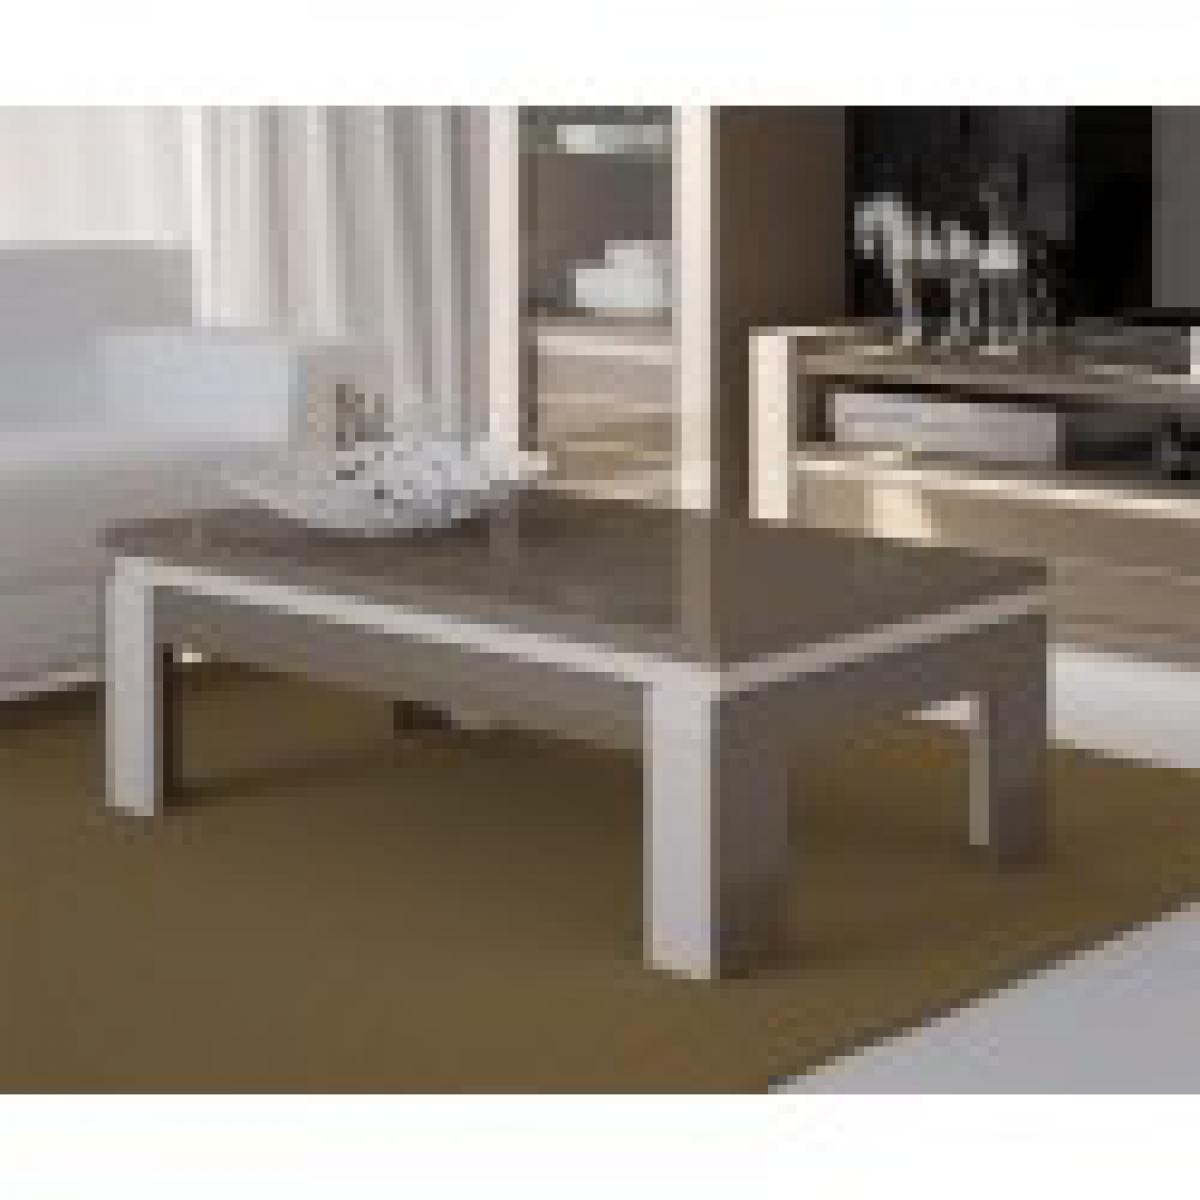 meublorama Table basse design brillante LINA. Coloris cappuccino et blanc crème. OFFRE LIMITEE